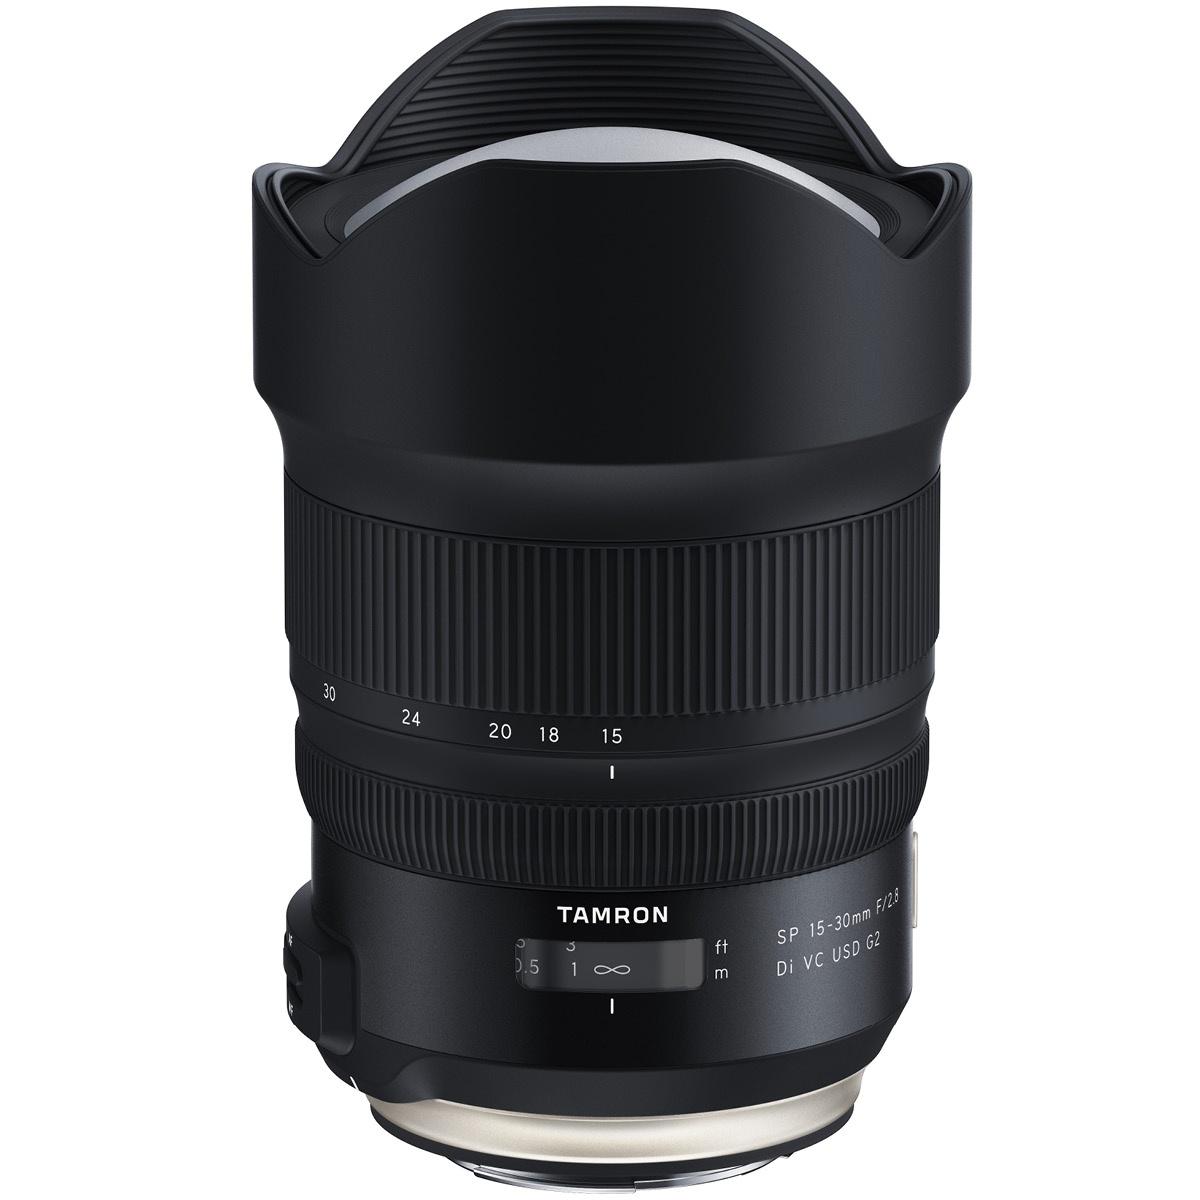 Tamron 15-30 mm 1:2,8 VC DI USD G2 EF